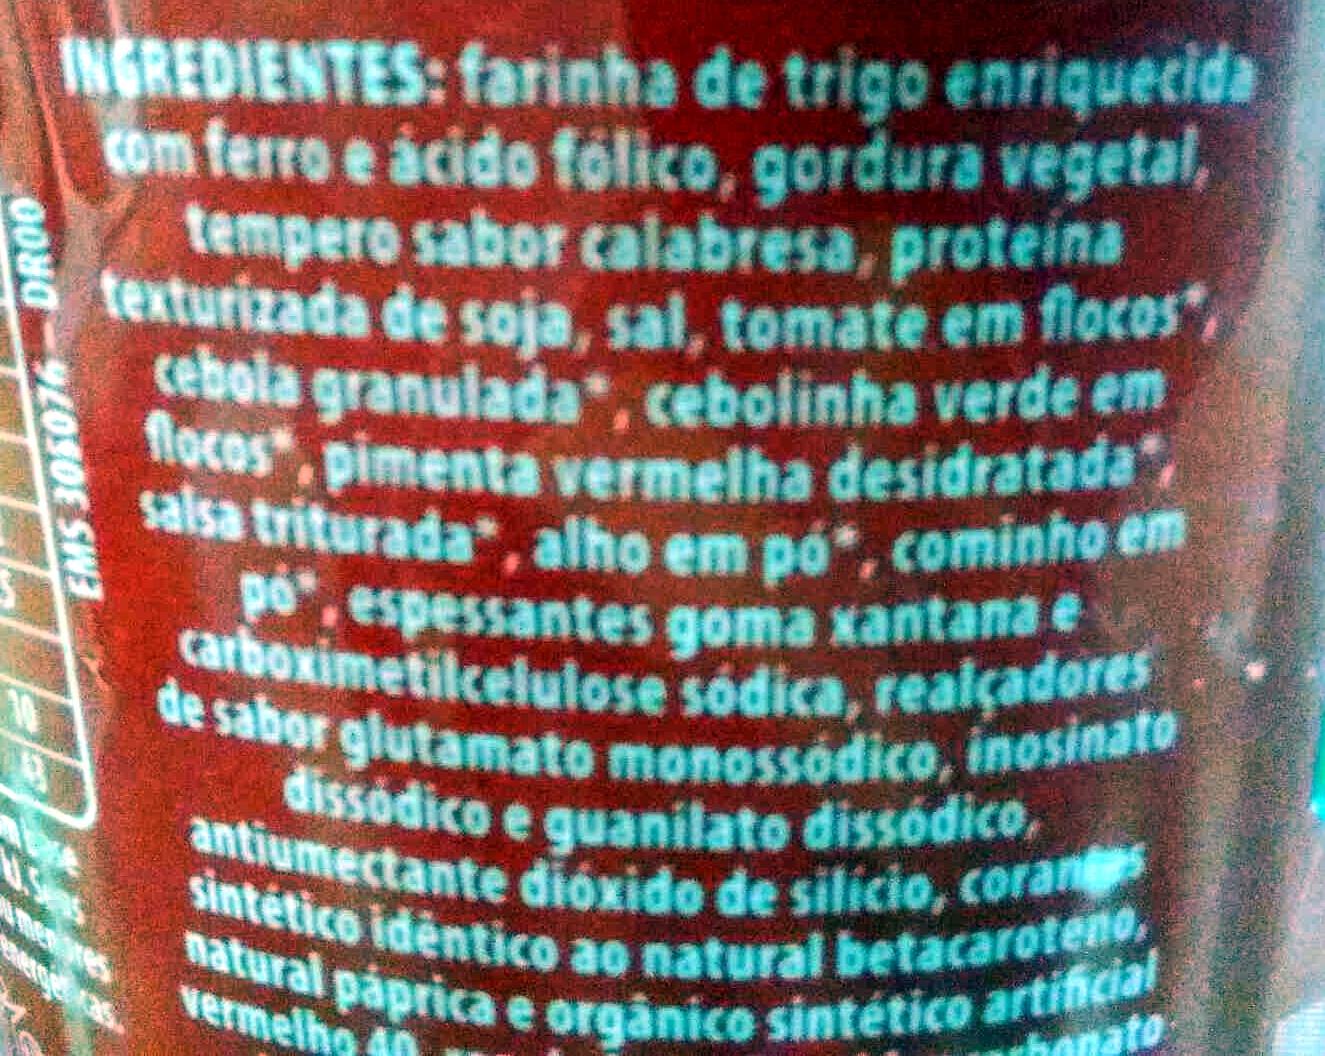 Cup Noodles Calabresa - Ingredientes - pt